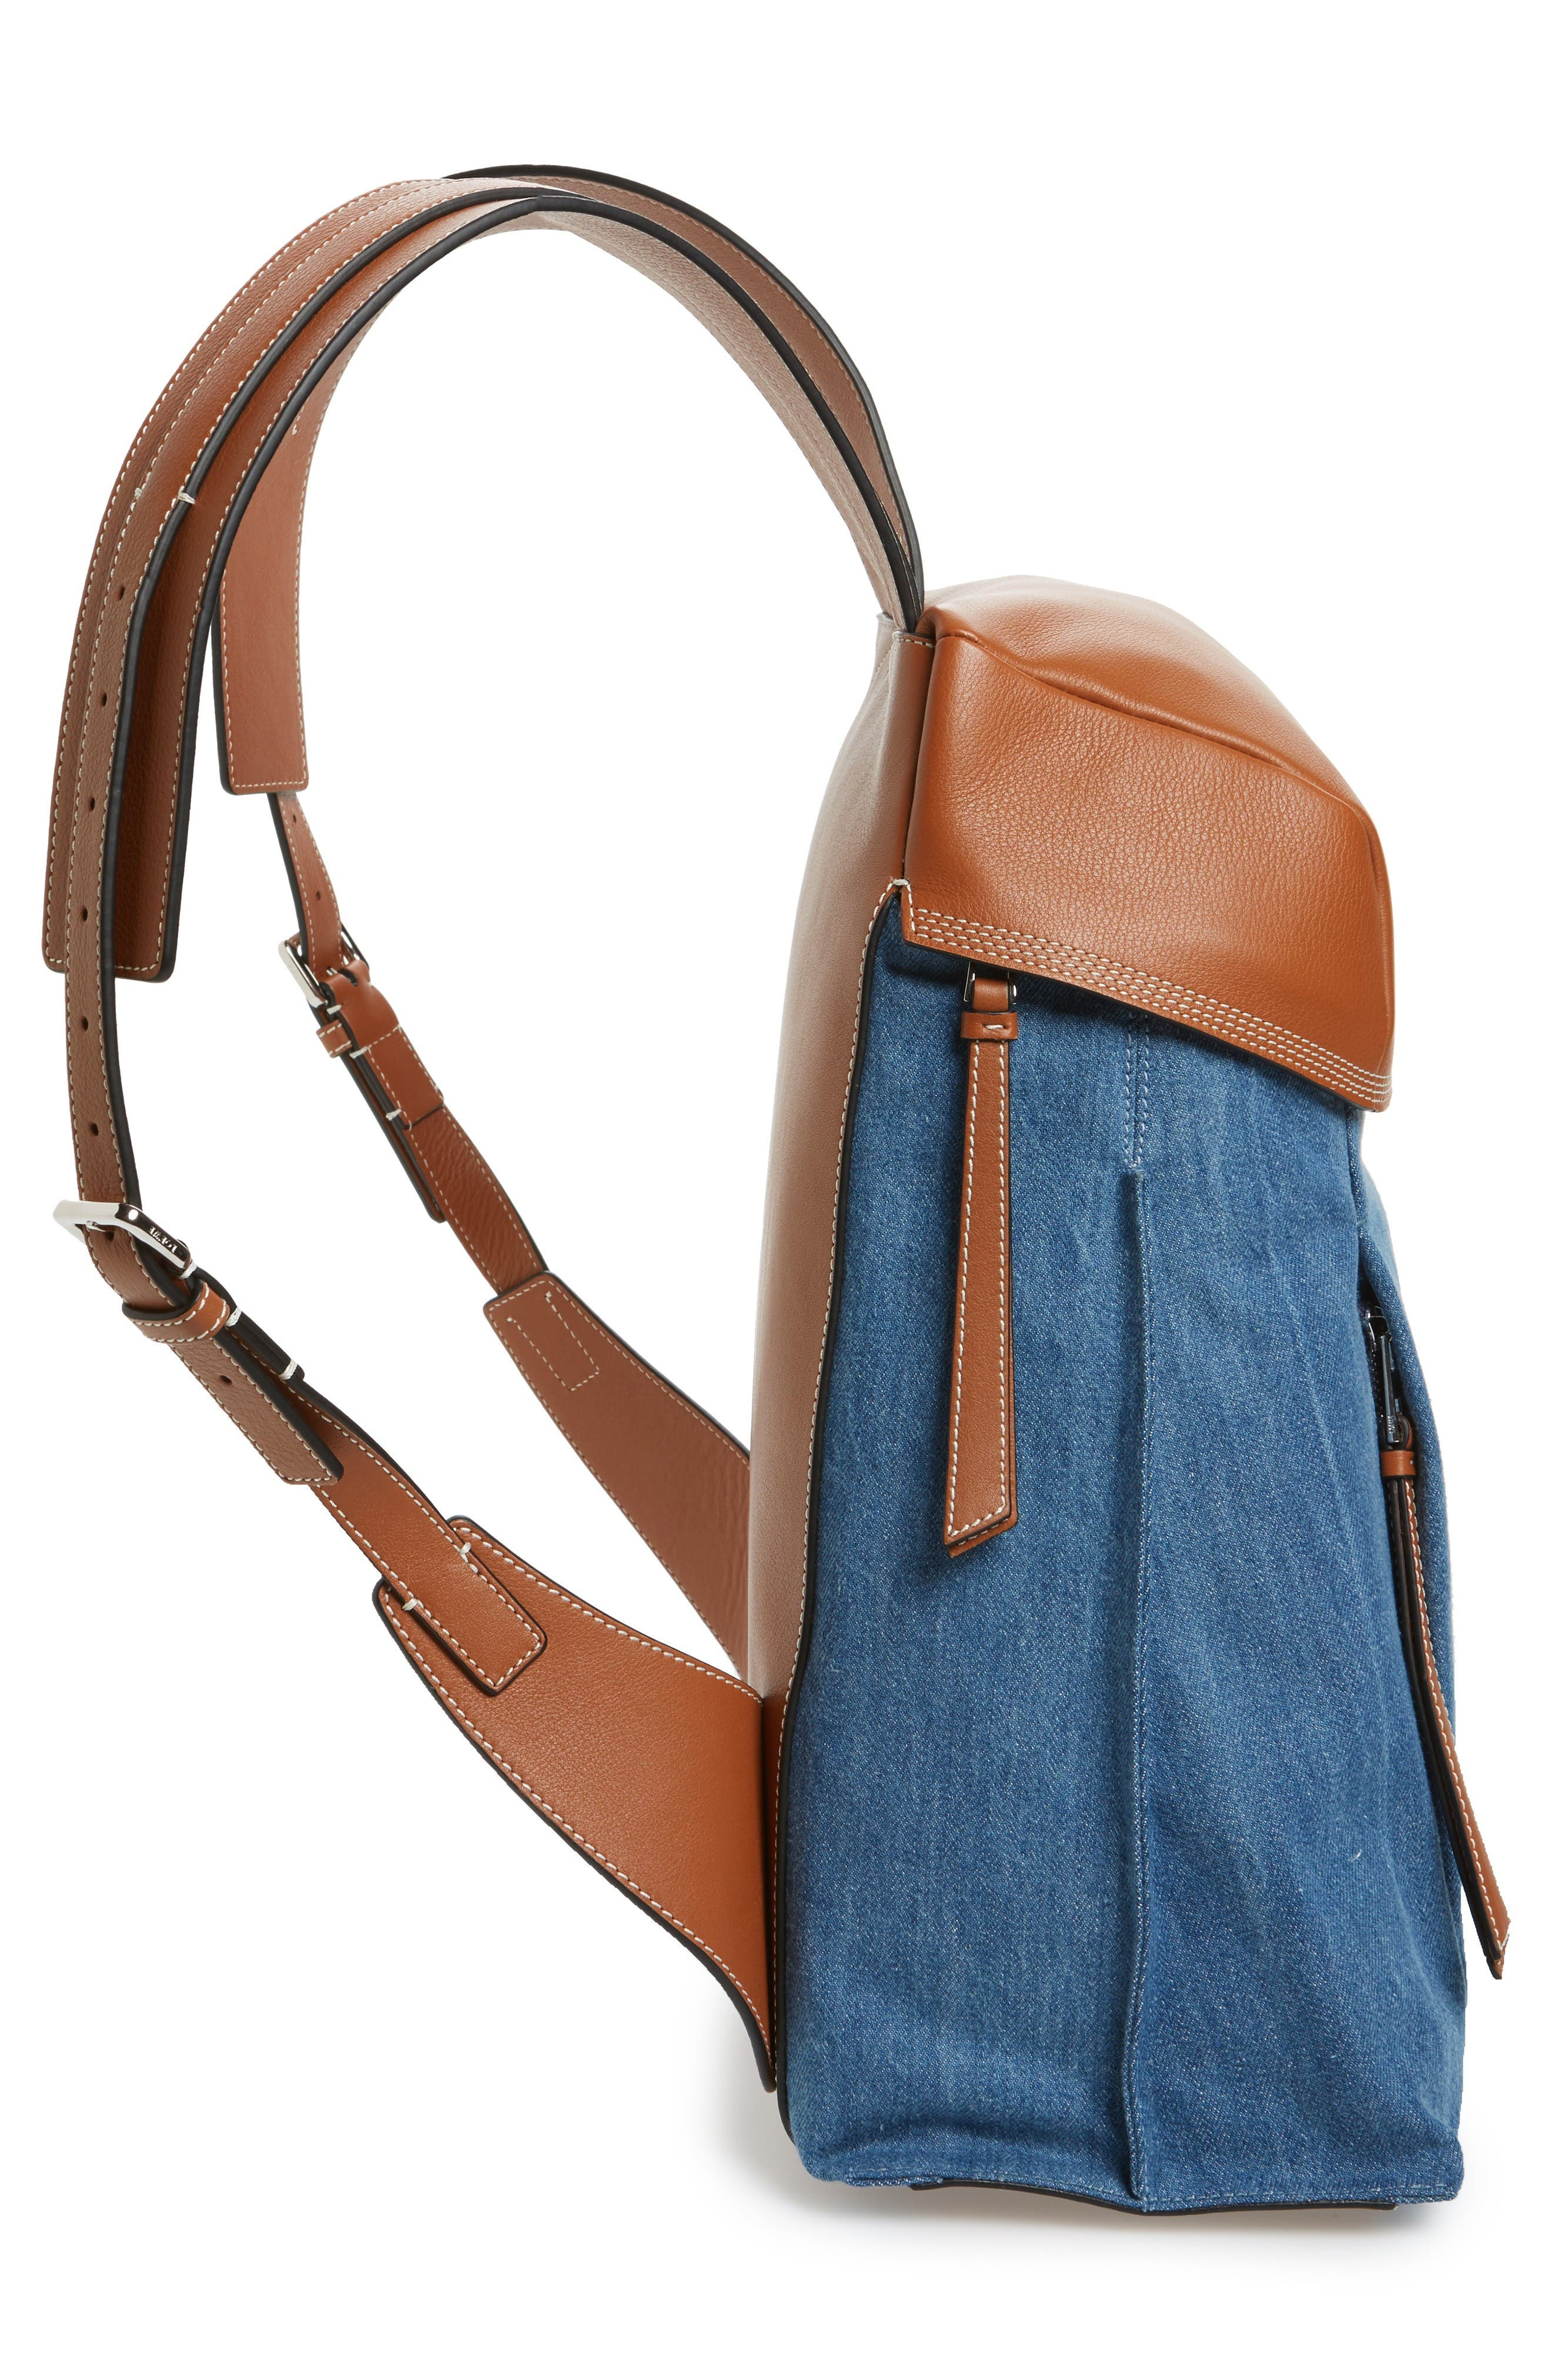 T Small Denim & Leather Backpack,                             Alternate thumbnail 4, color,                             Dark Blue/Tan